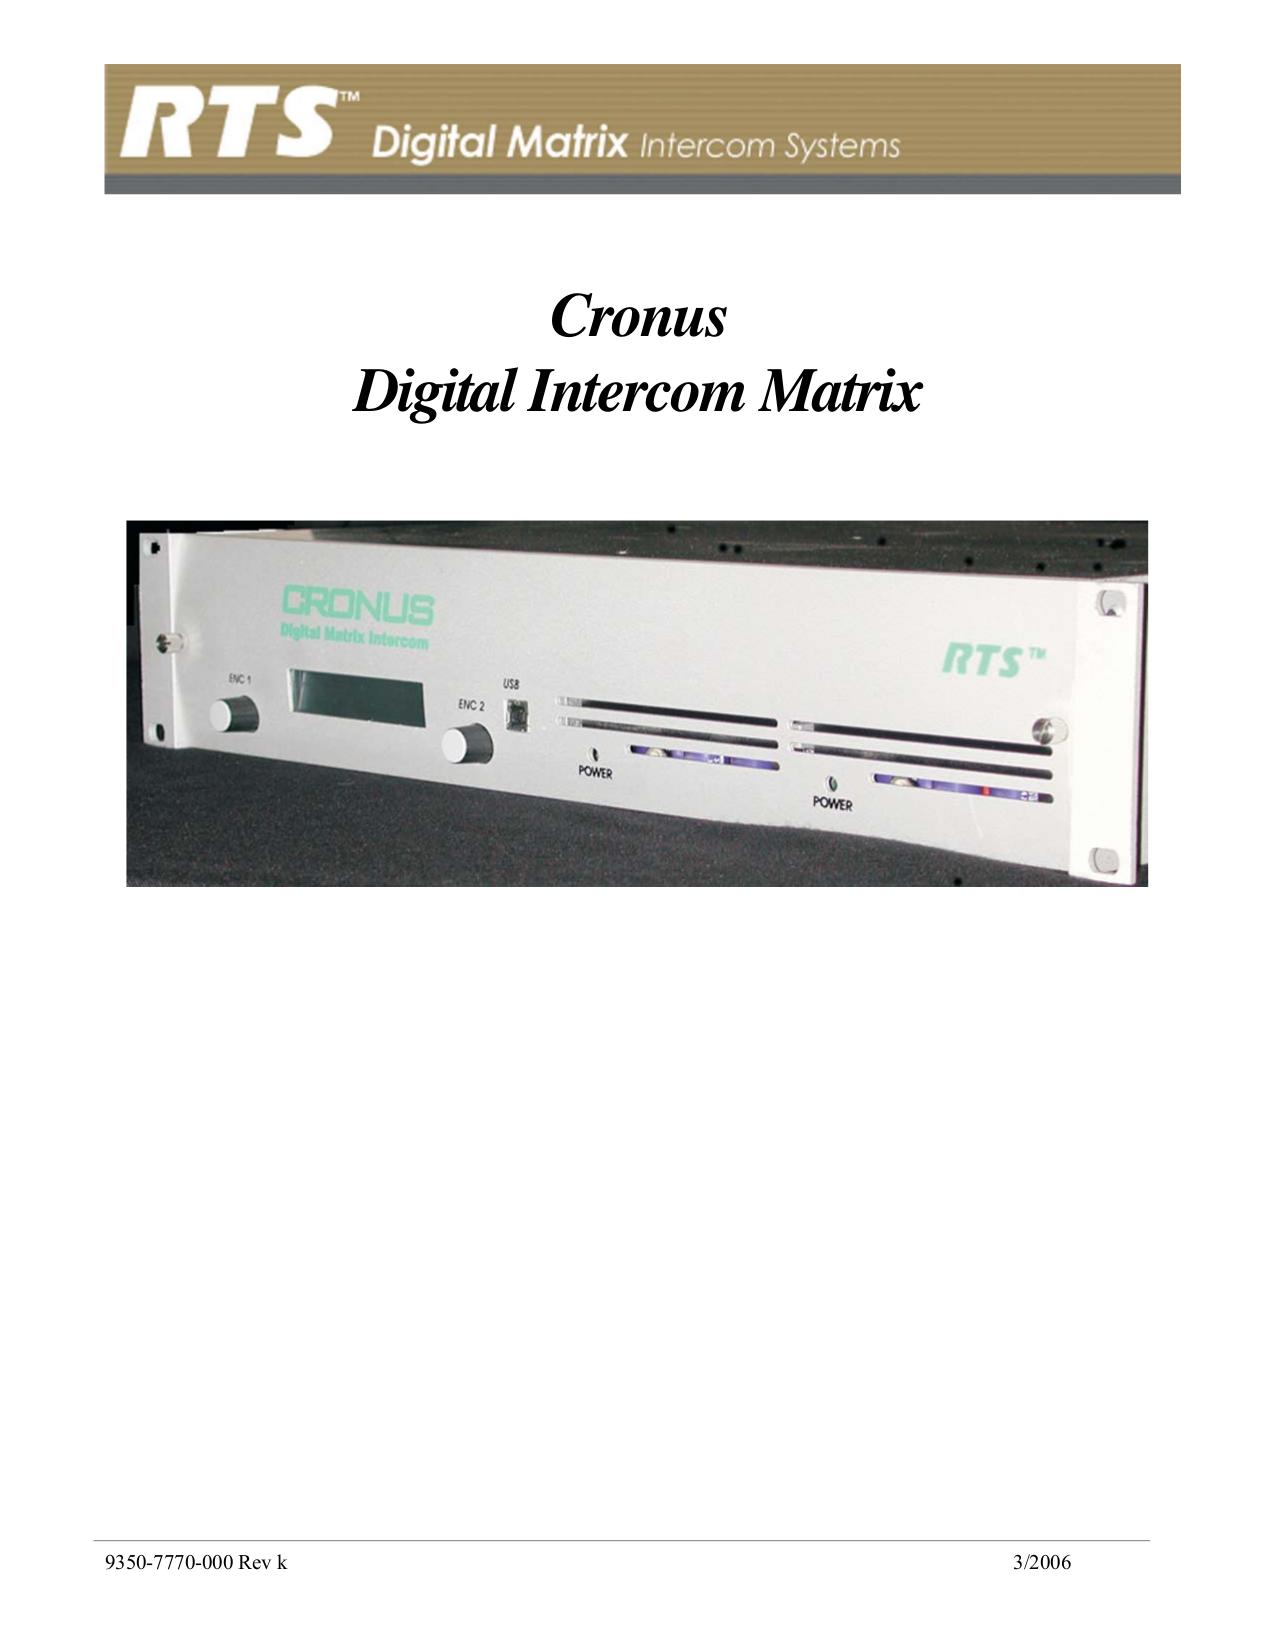 pdf for Telex Other XCP-16-DB9-T IntercomSystem manual